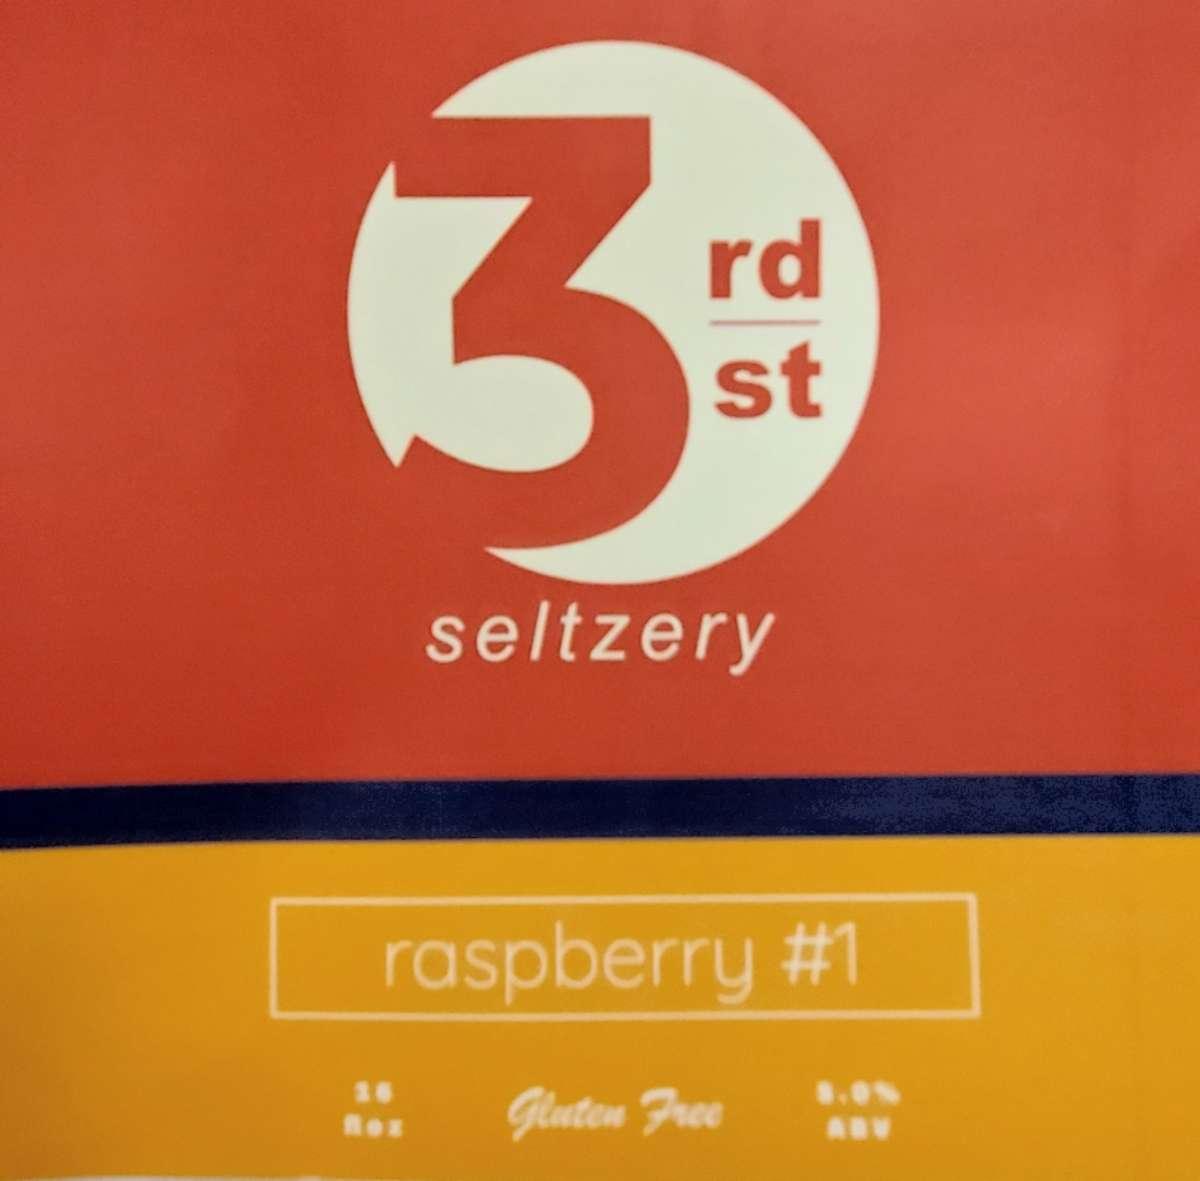 *** NEW *** 3rd Street Seltzery - #2 Pineapple / Mango